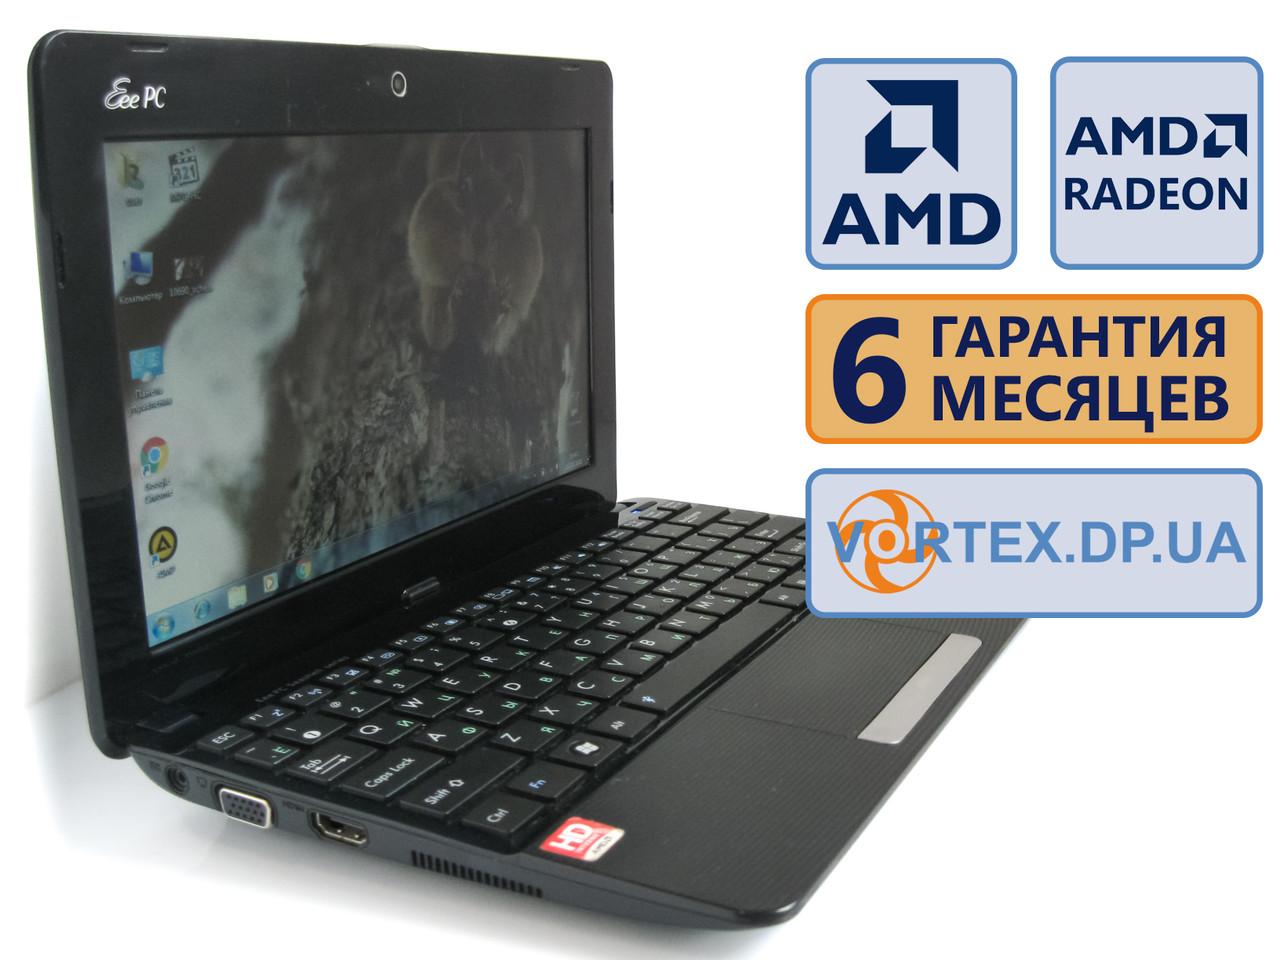 Нетбук Asus EeePC 1015bx 10.1 (1024х600) / AMD C60 (2x1GHz) / RAM 1Gb